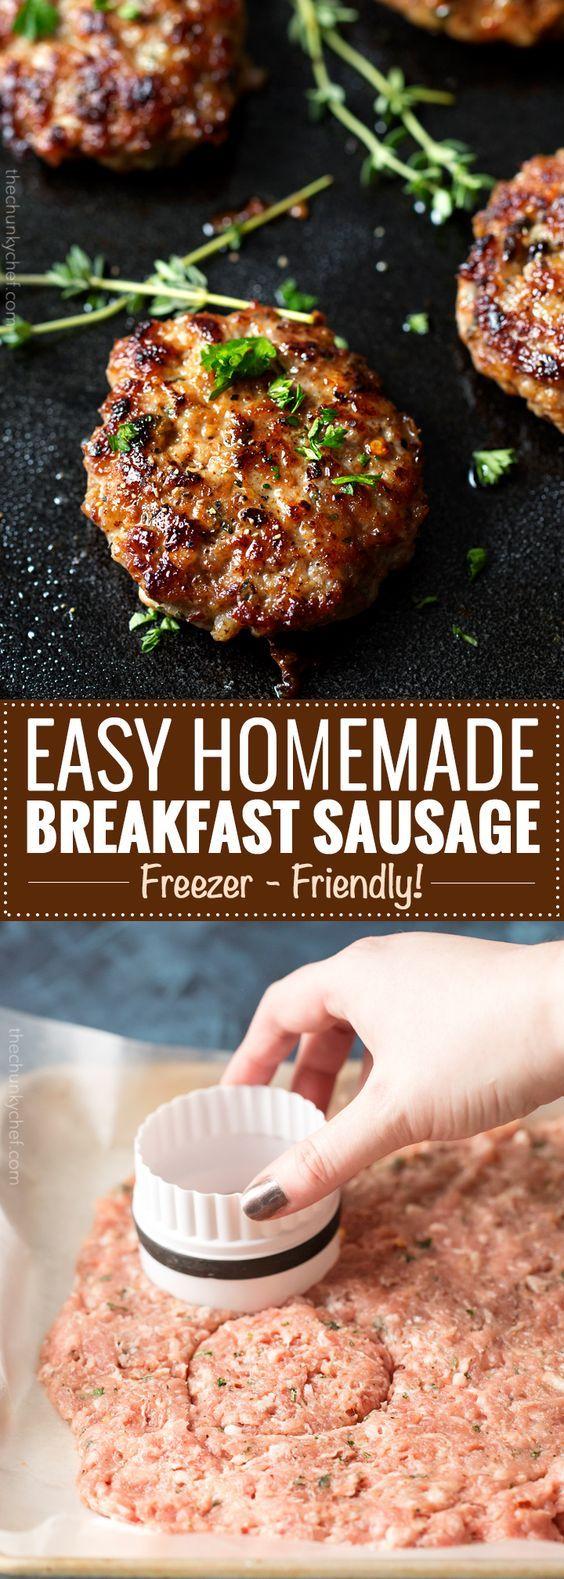 Simple Breakfast Sausage Recipe